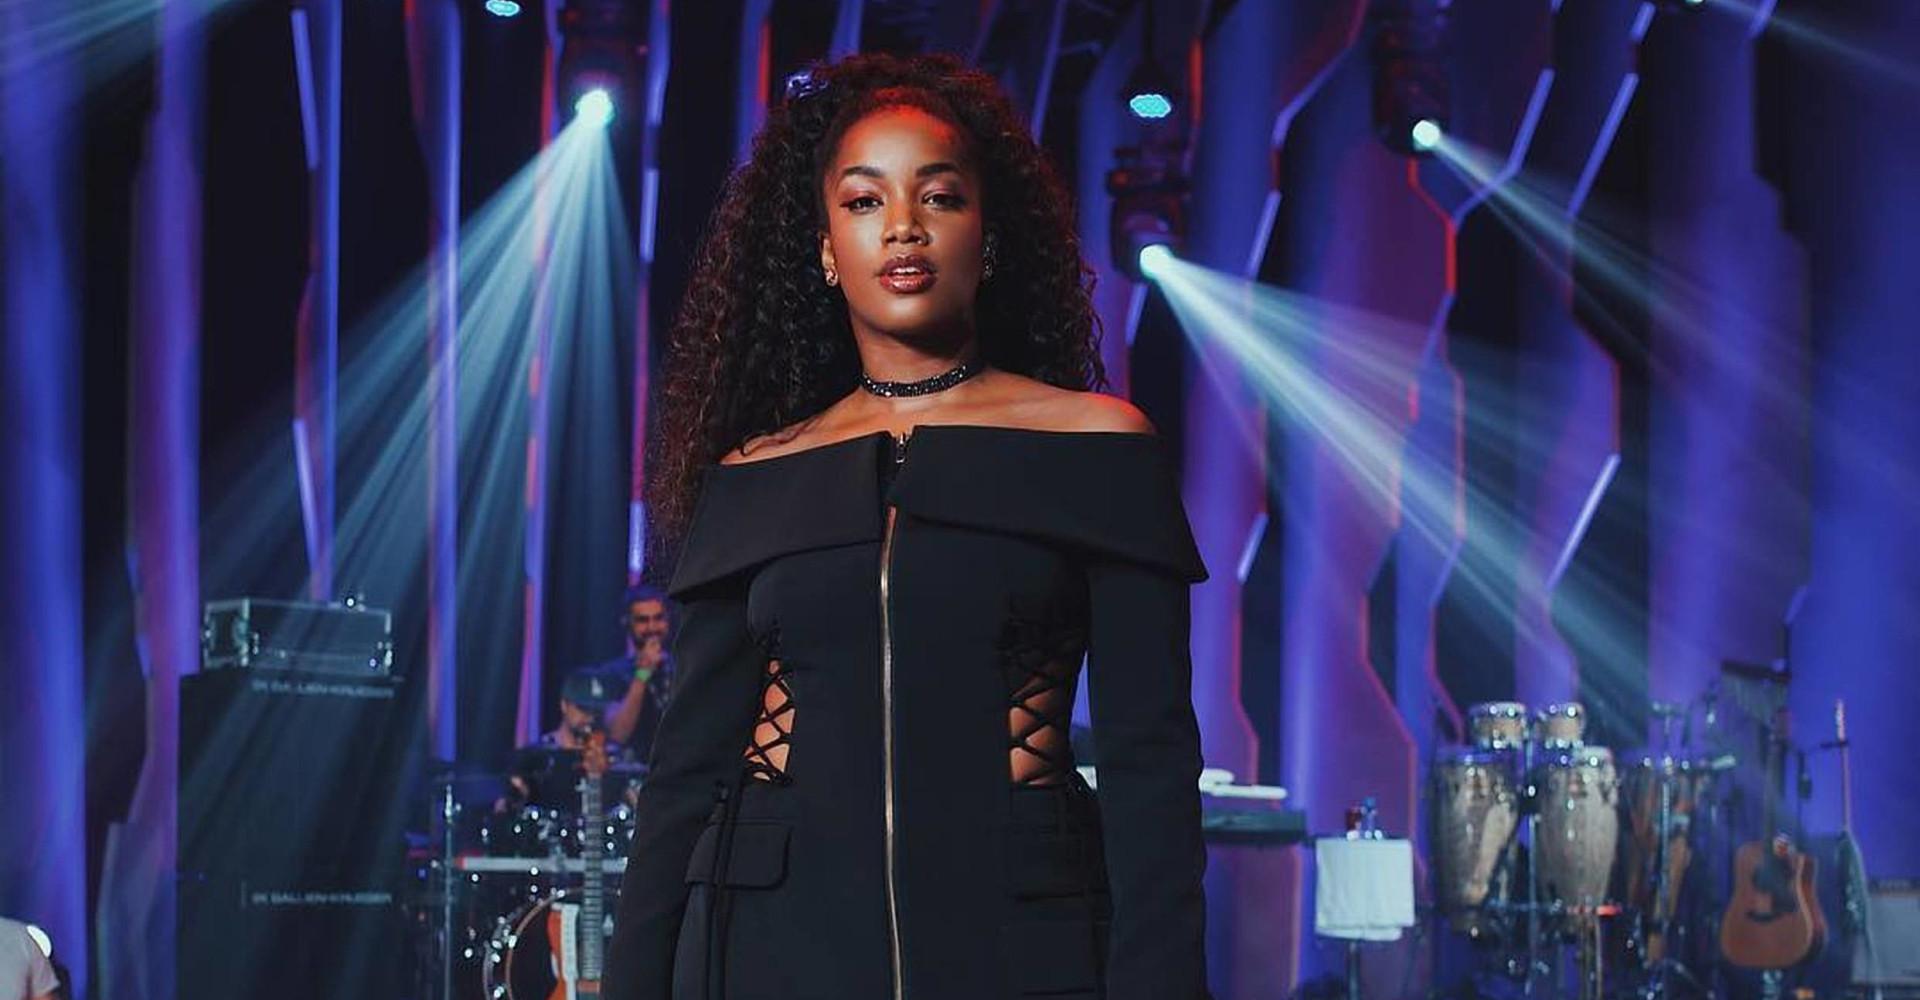 Cantora Iza é confirmada no 'Música Boa Ao Vivo' para 2019